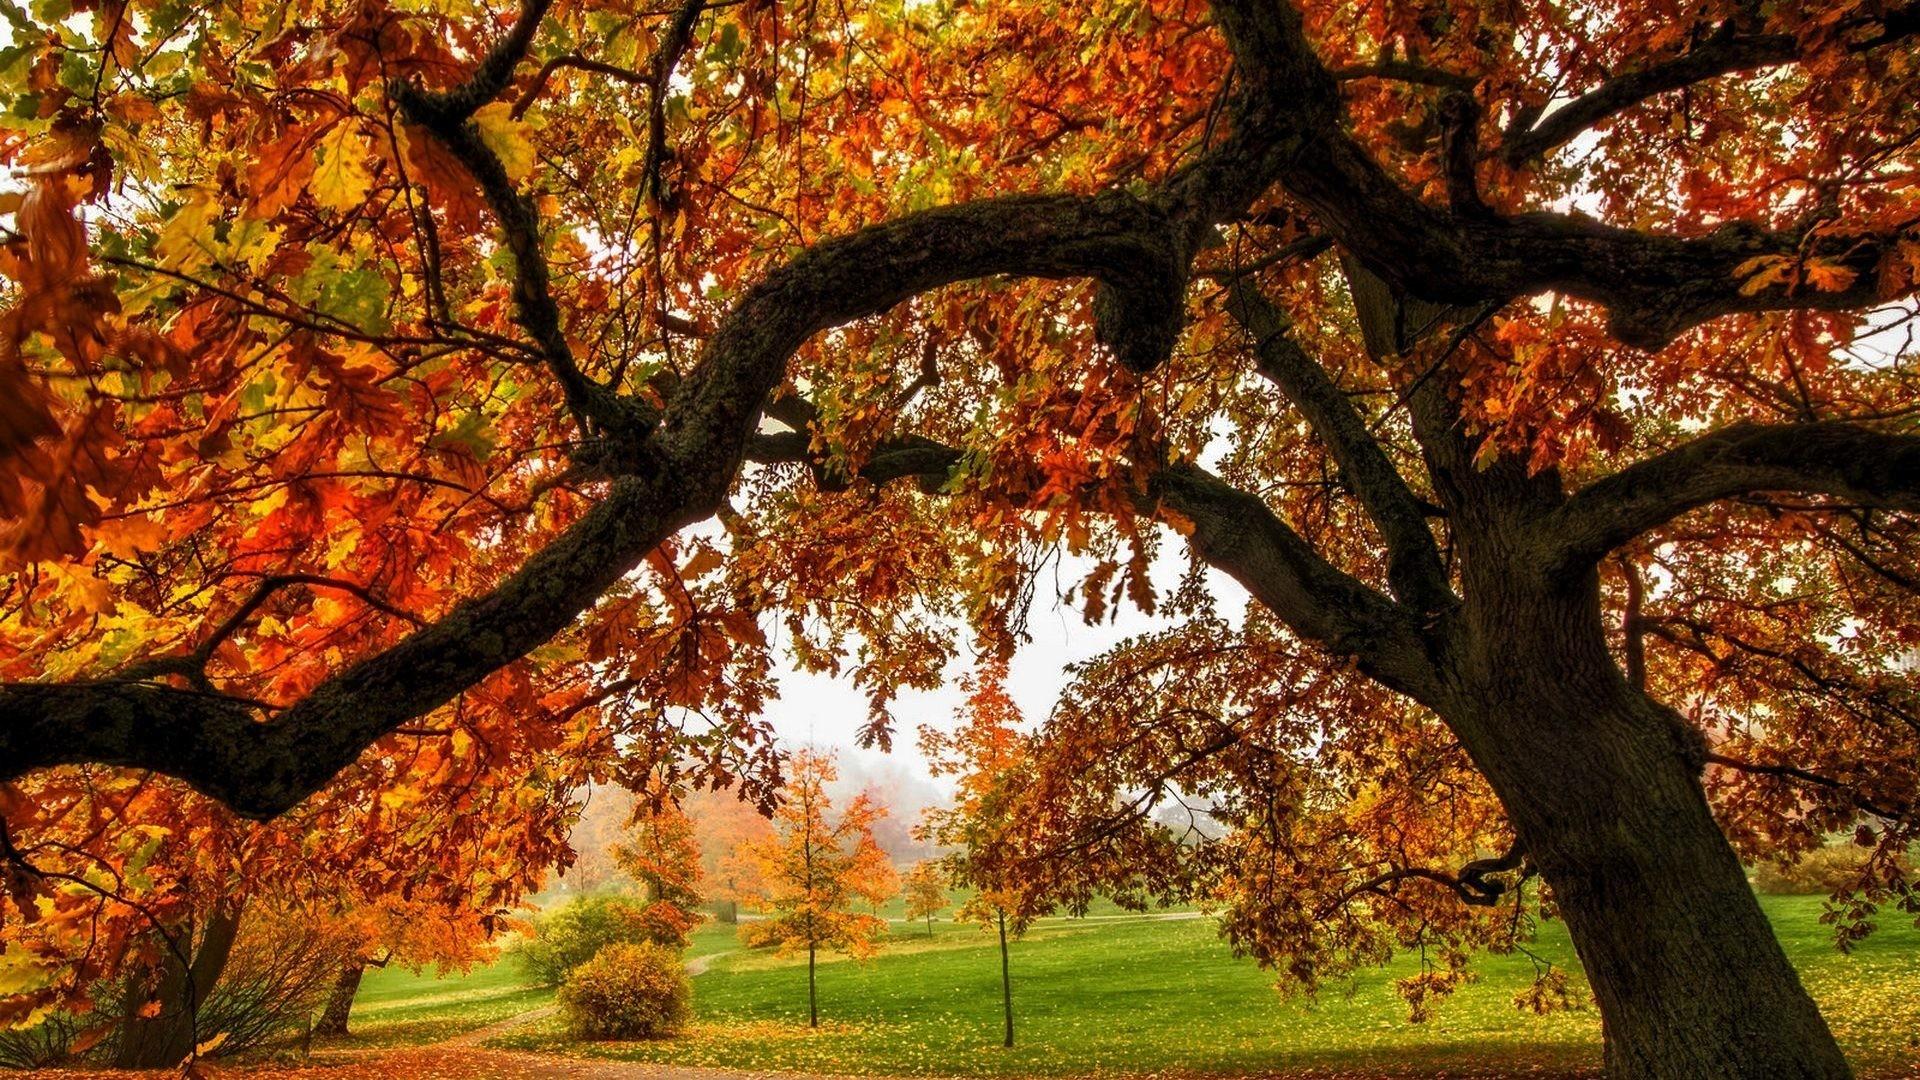 Colorful Fall Colors Forest Park Splendor Path Nature Walk Leaves Road  Trees Autumn Desktop Backgrounds – 1920×1324